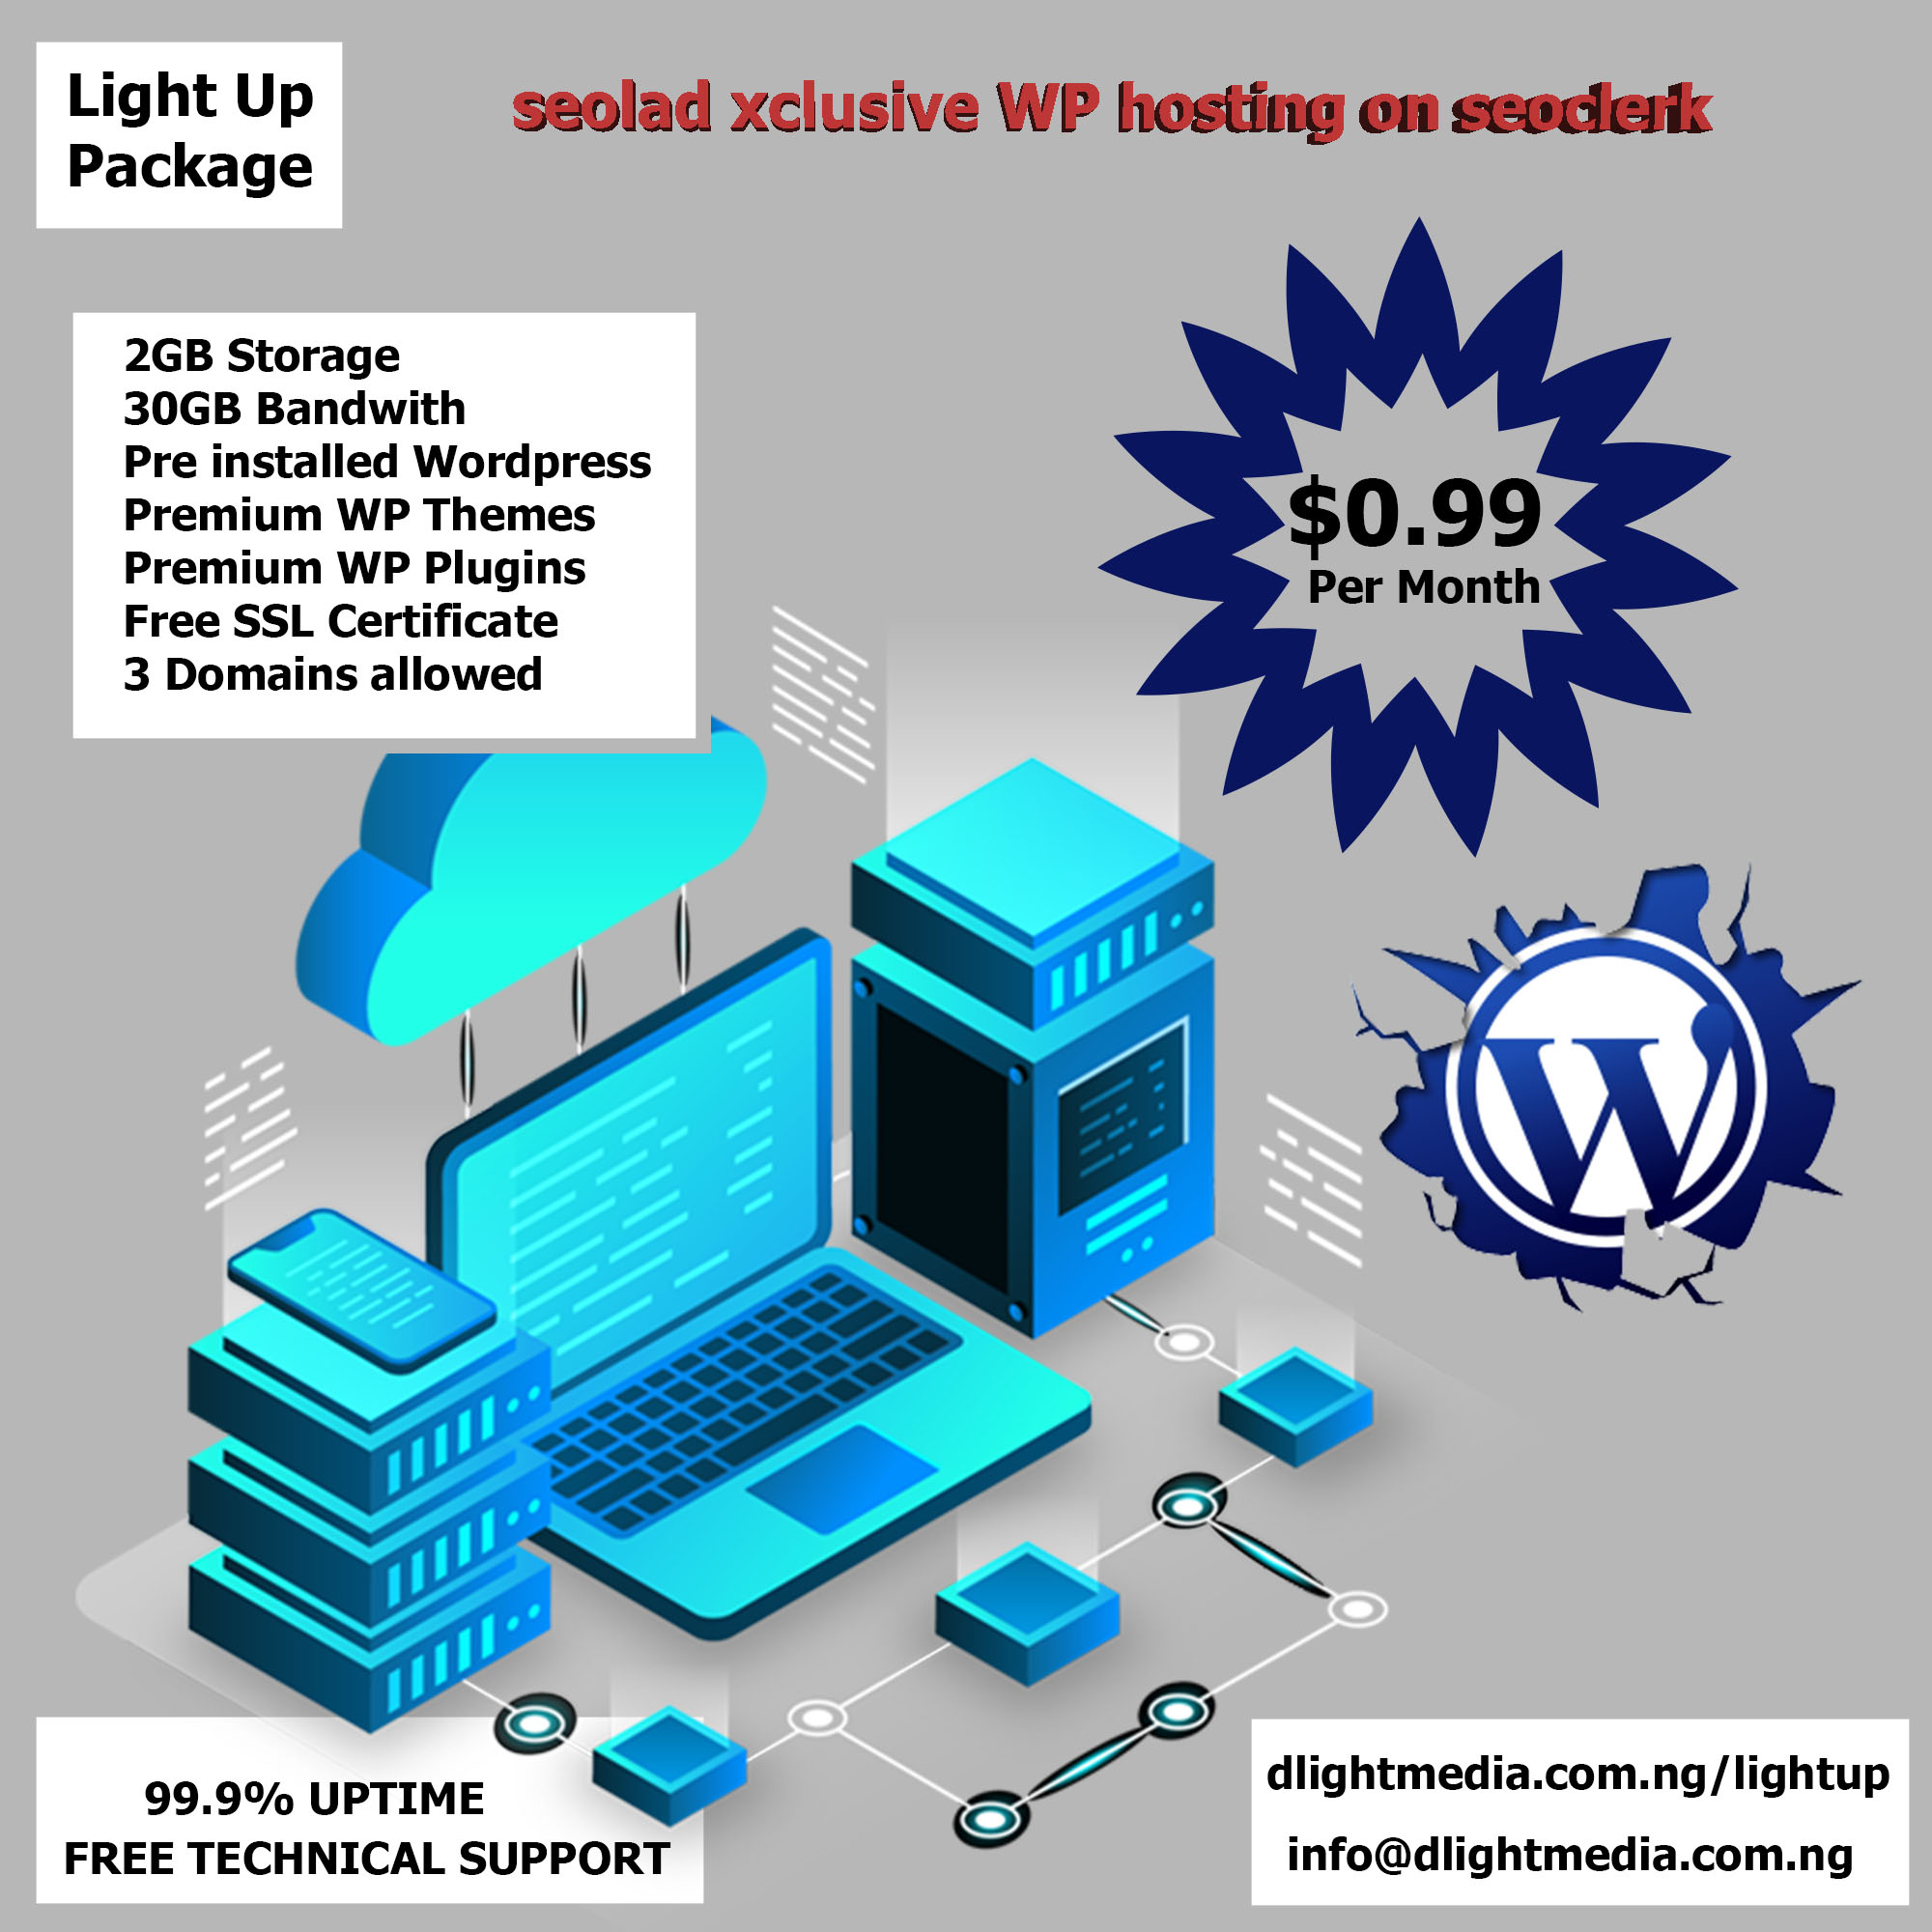 High quality WP Hosting plus Premium themes and plugins